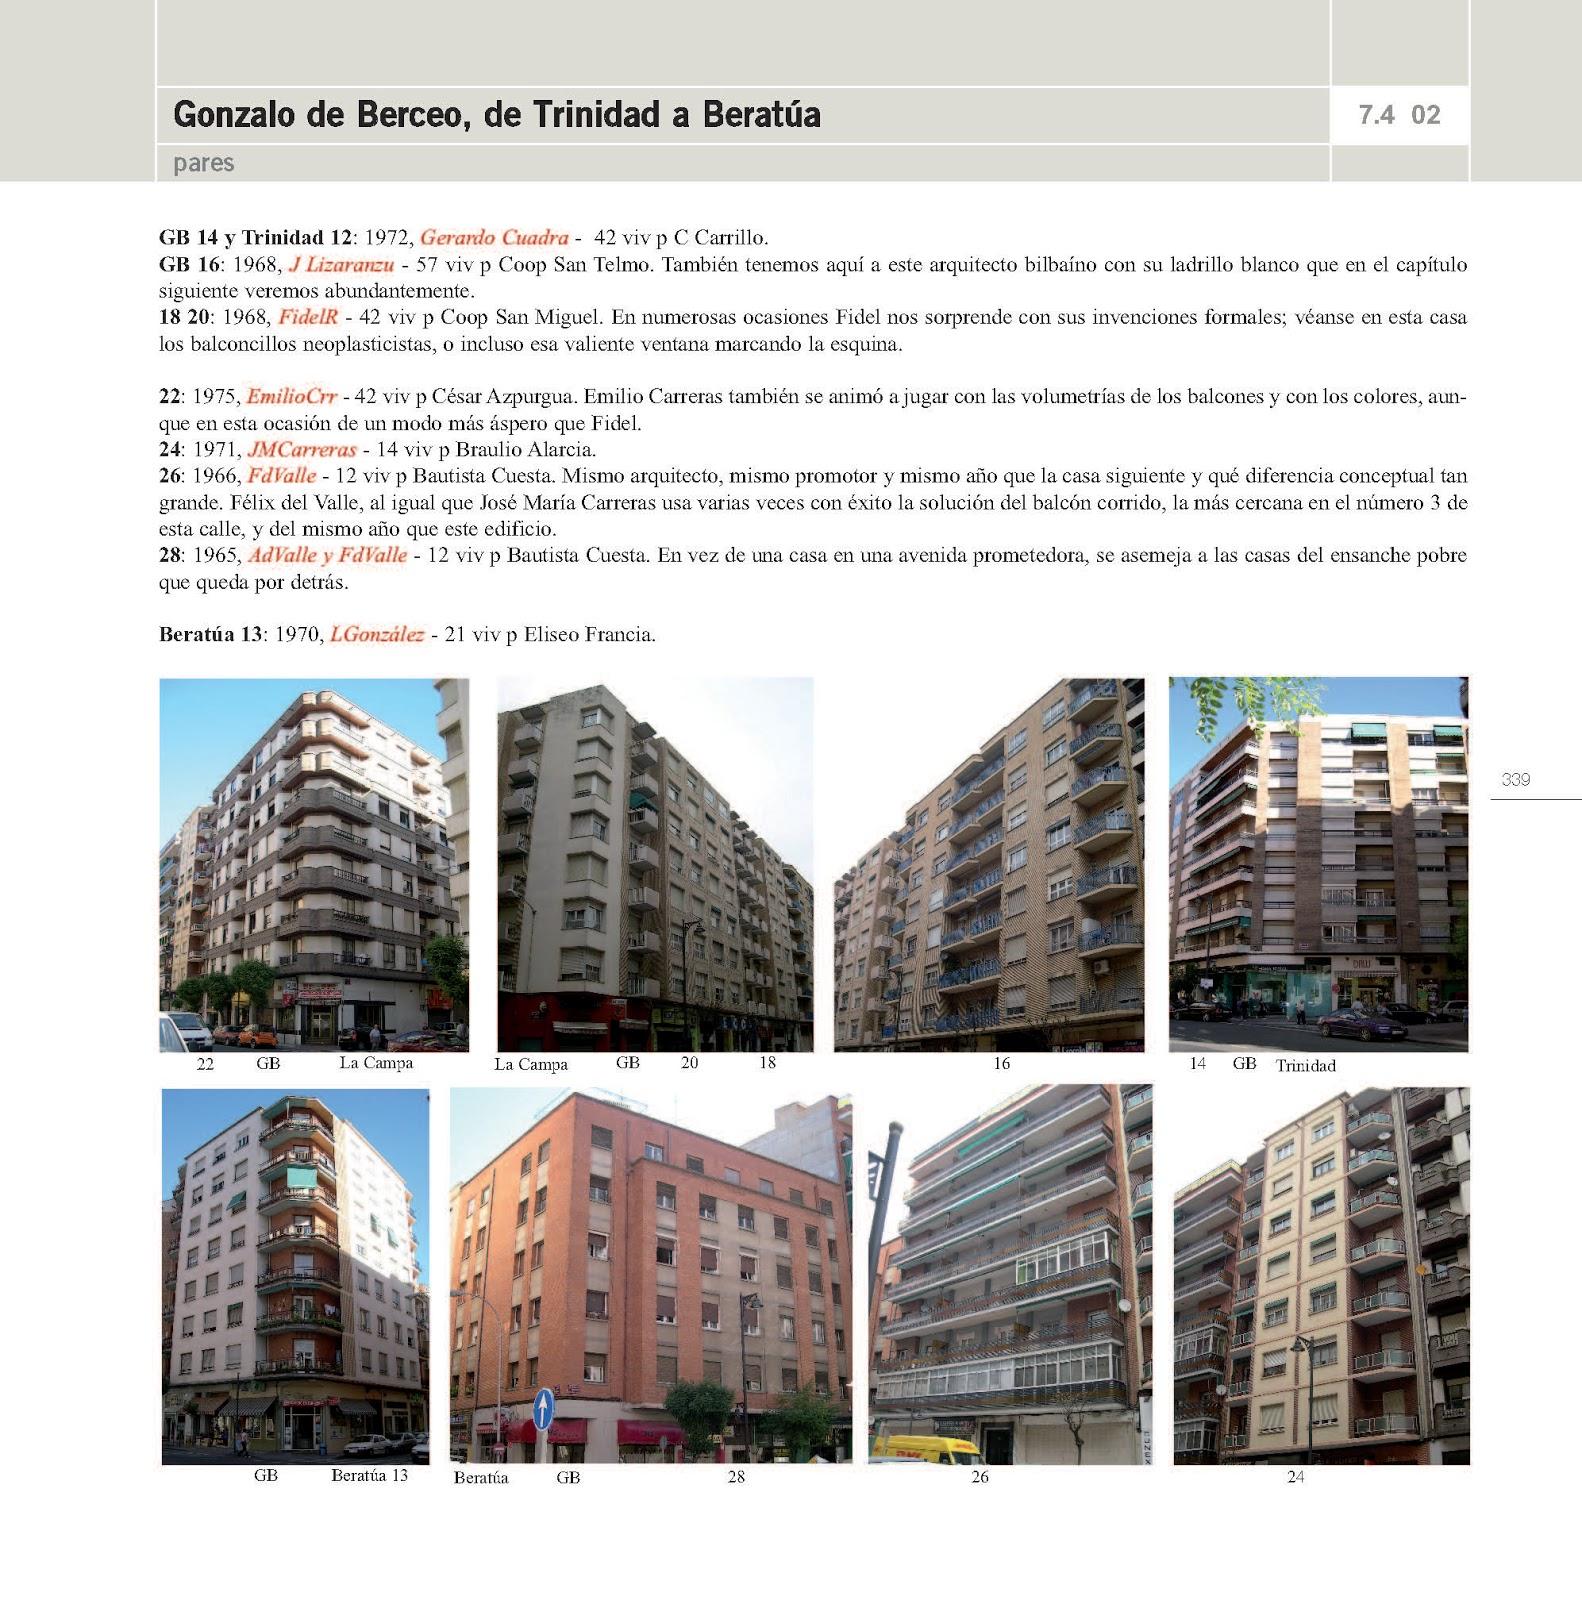 Guia De Arquitectura De Logro O Paginas 7 4 02 Gonzalo